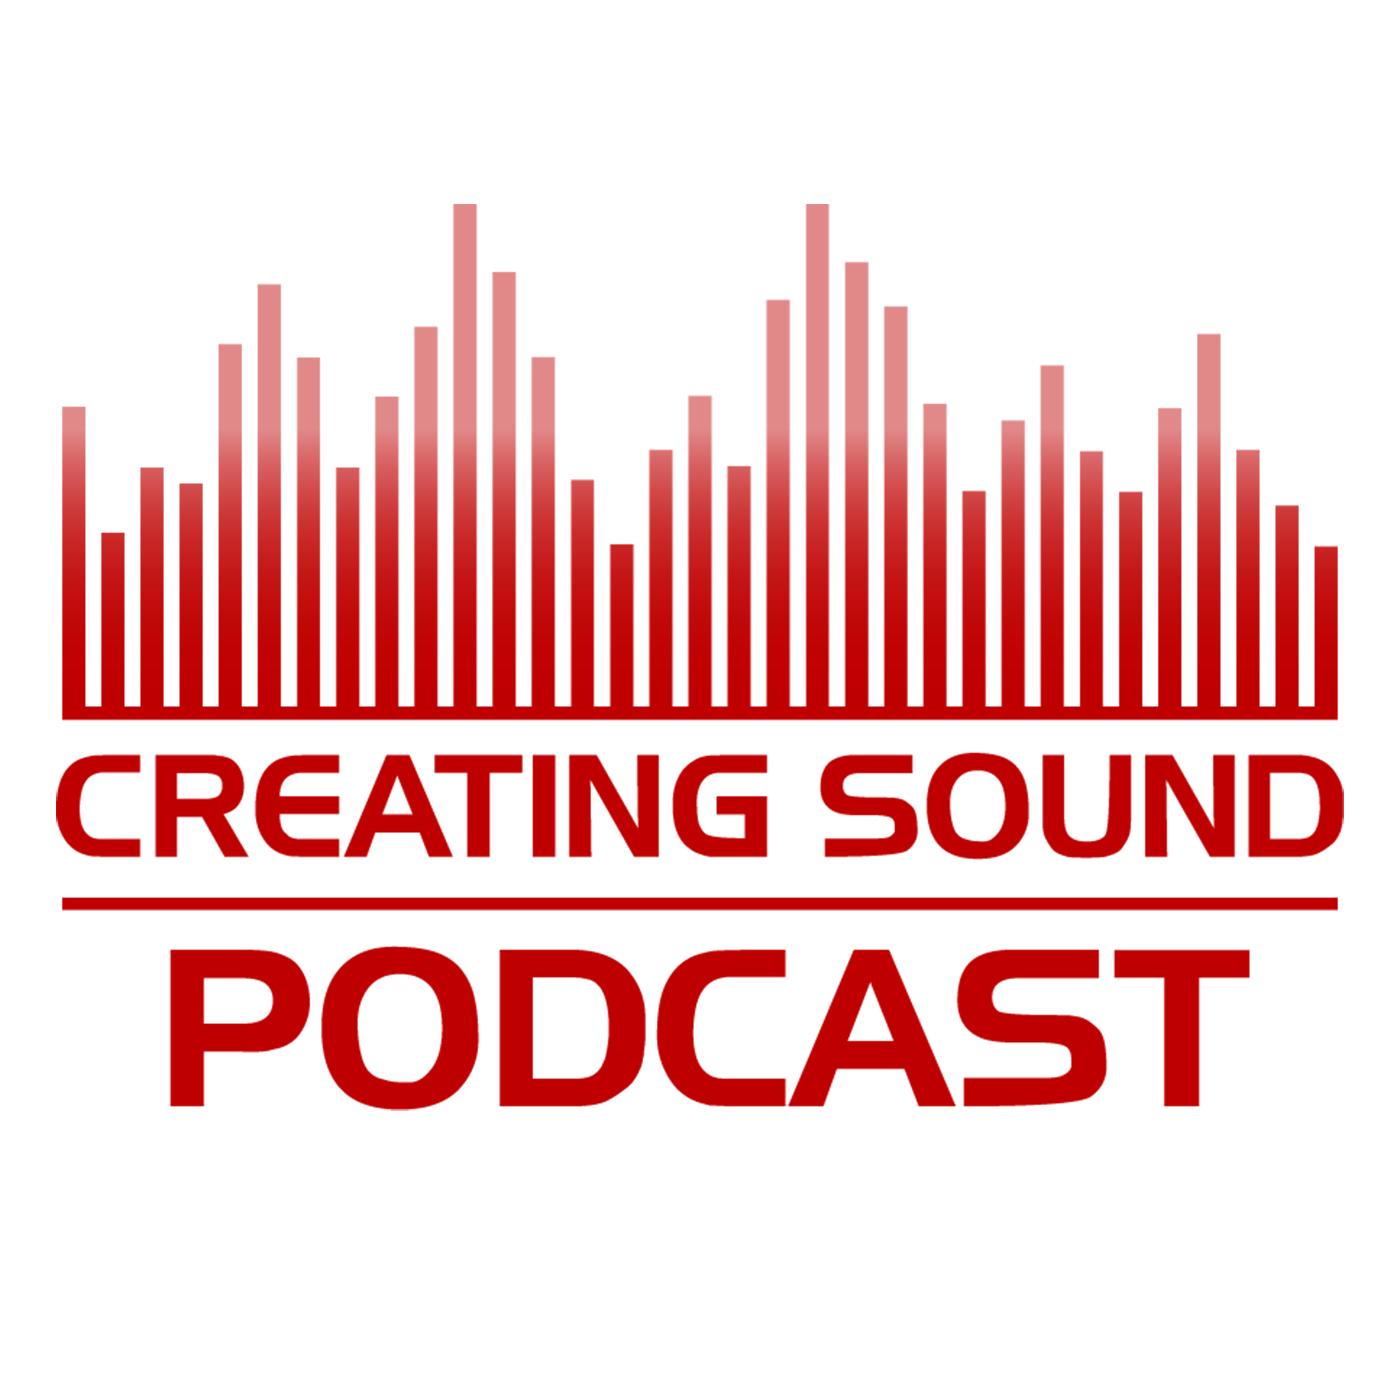 Creating Sound